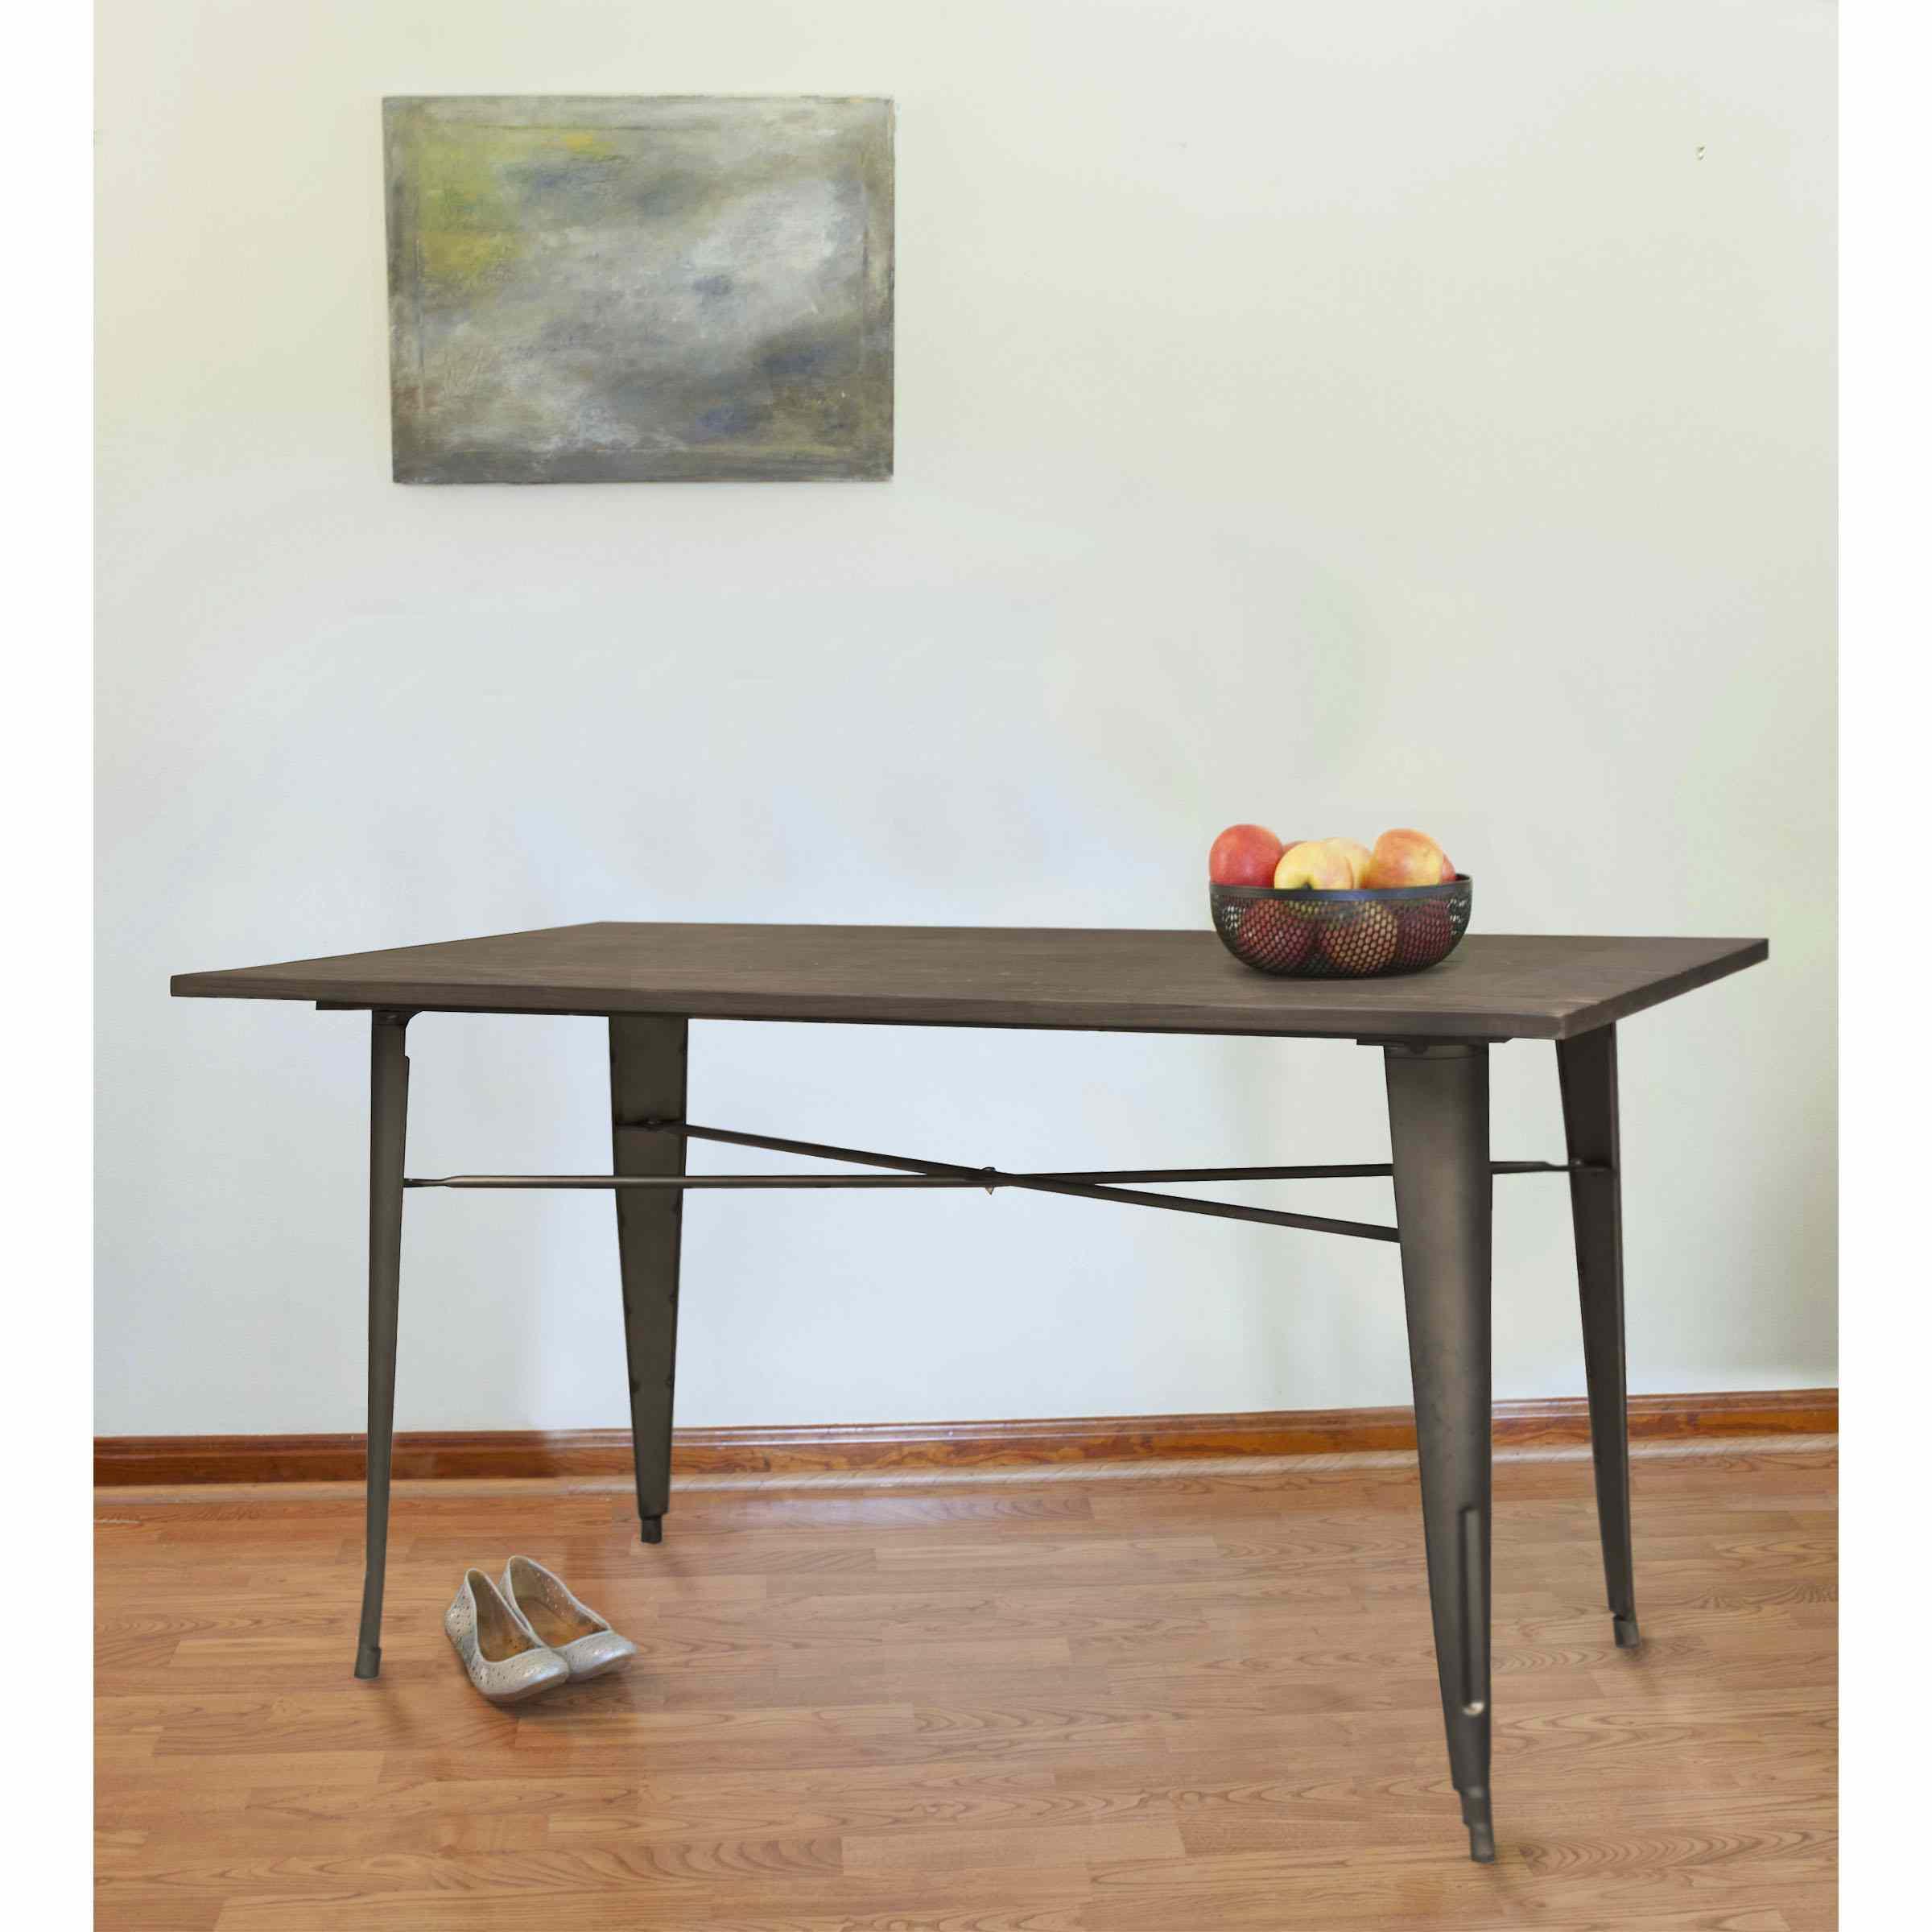 AmeriHome Loft Rustic Gunmetal Metal Dining Table with Wood Top